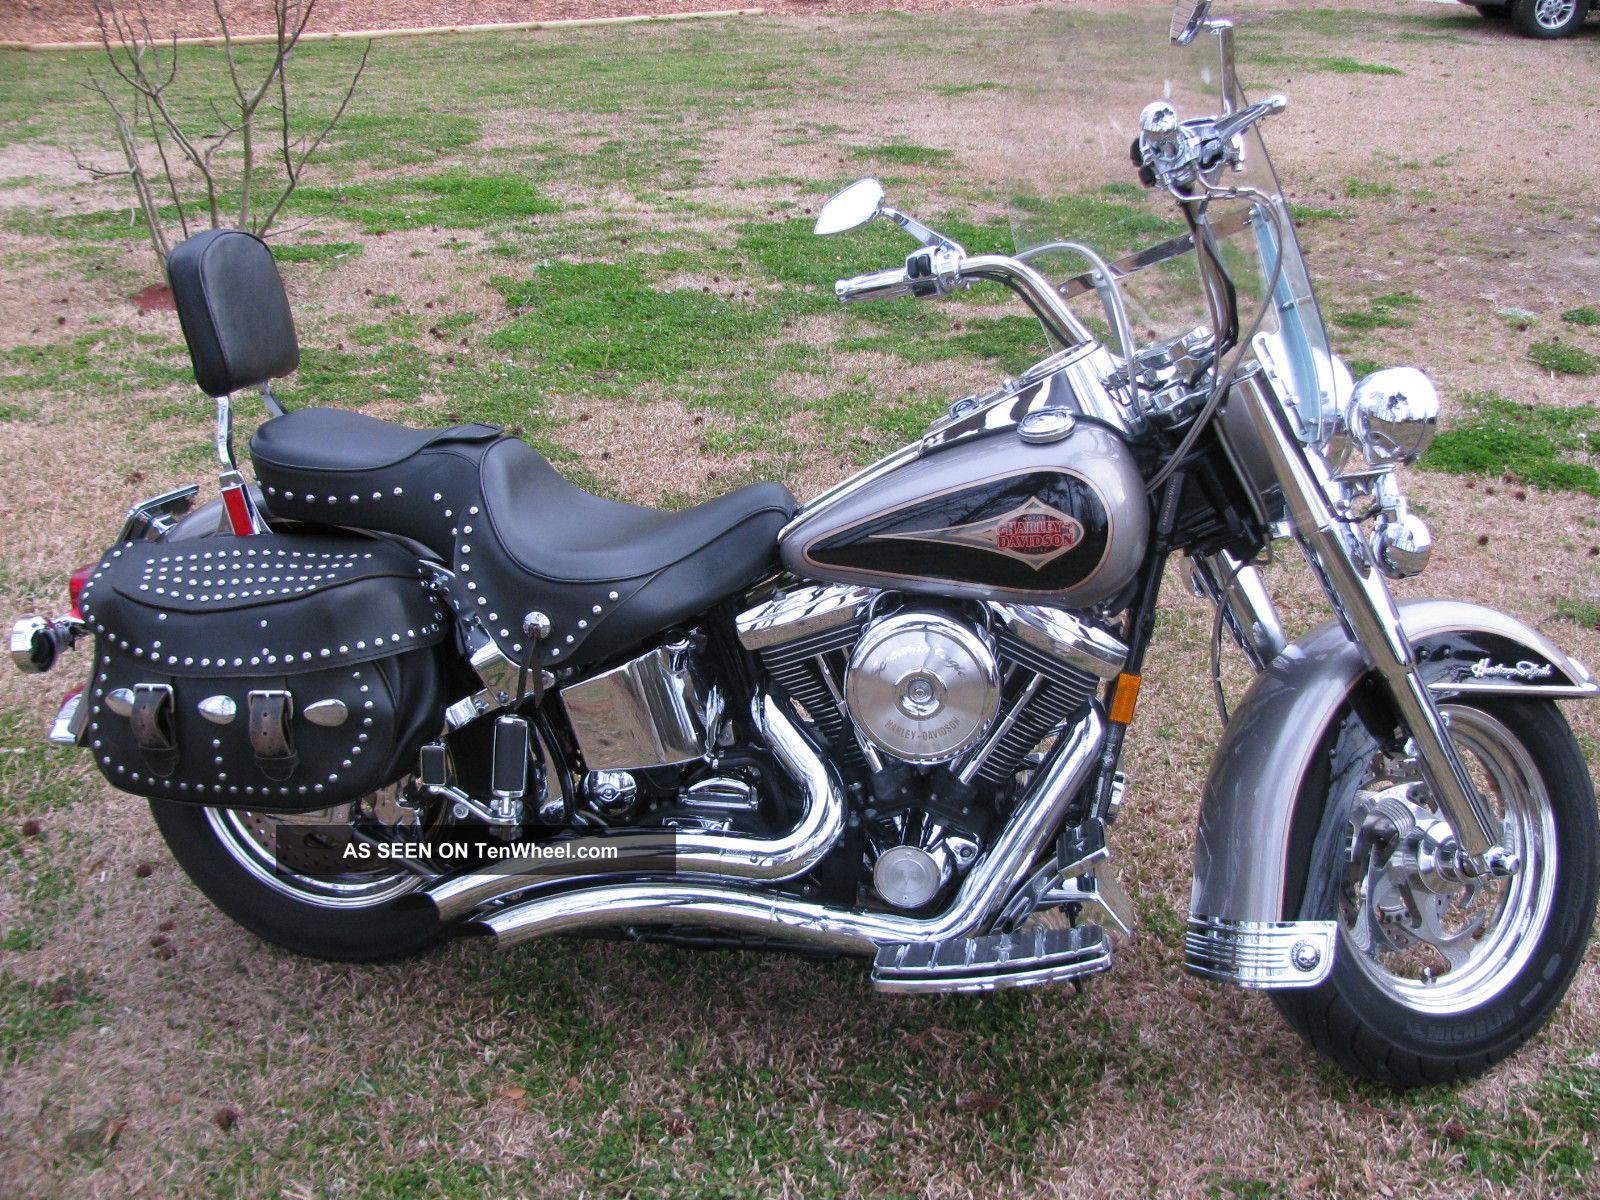 1997 Harley Davidson Flstc Heritage Softail Classic